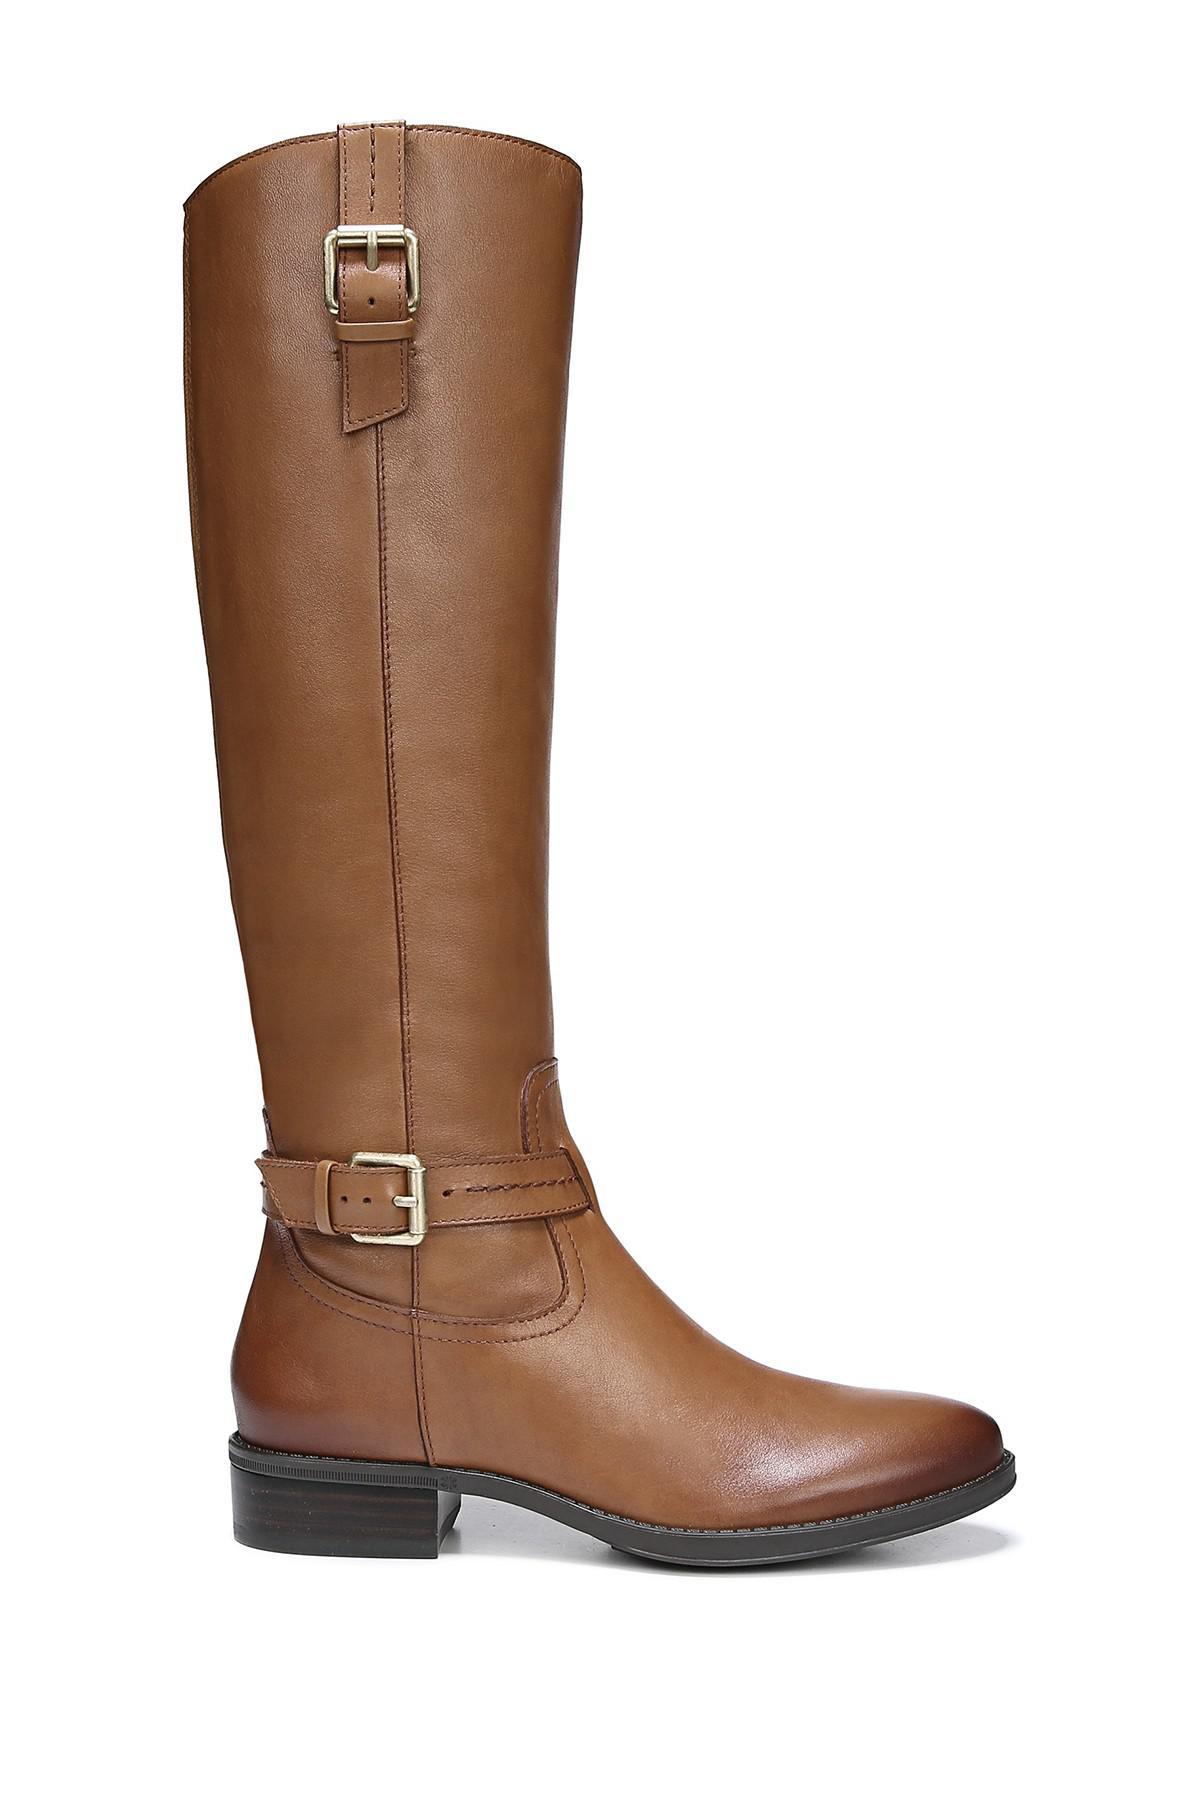 686b6d615d1 Sam Edelman Brown Ponce Buckle Tall Boot